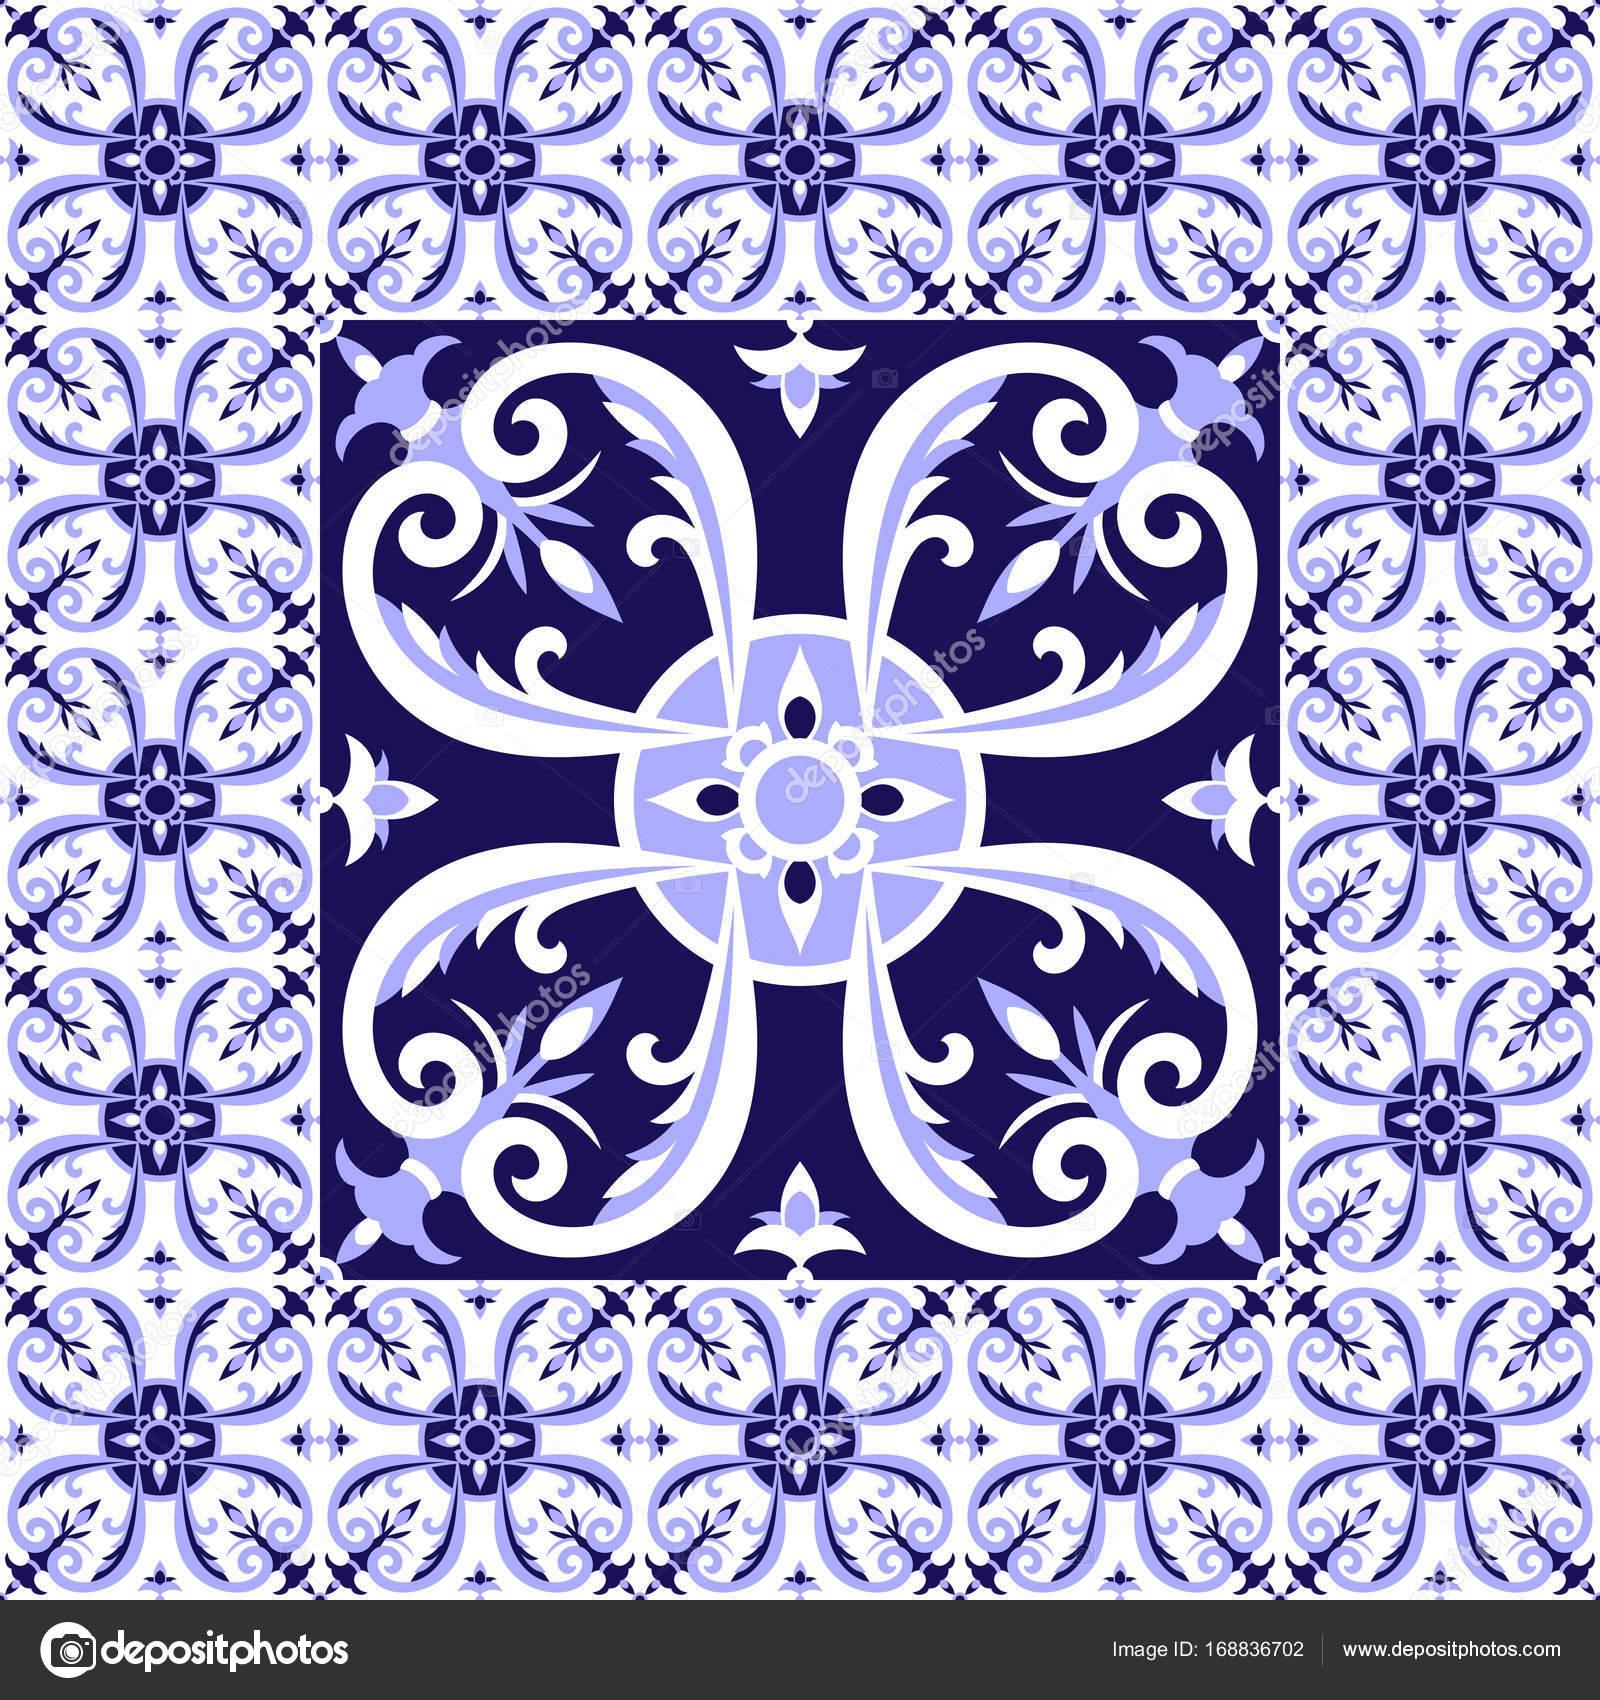 Great 16X32 Ceiling Tiles Thick 18 Inch Floor Tile Solid 18 X 18 Ceramic Tile 20 X 20 Floor Tile Patterns Young 24 X 24 Ceiling Tiles Blue3 X 12 Subway Tile Arabic White Blue Tiles Floor Pattern Vector \u2014 Stock Vector ..